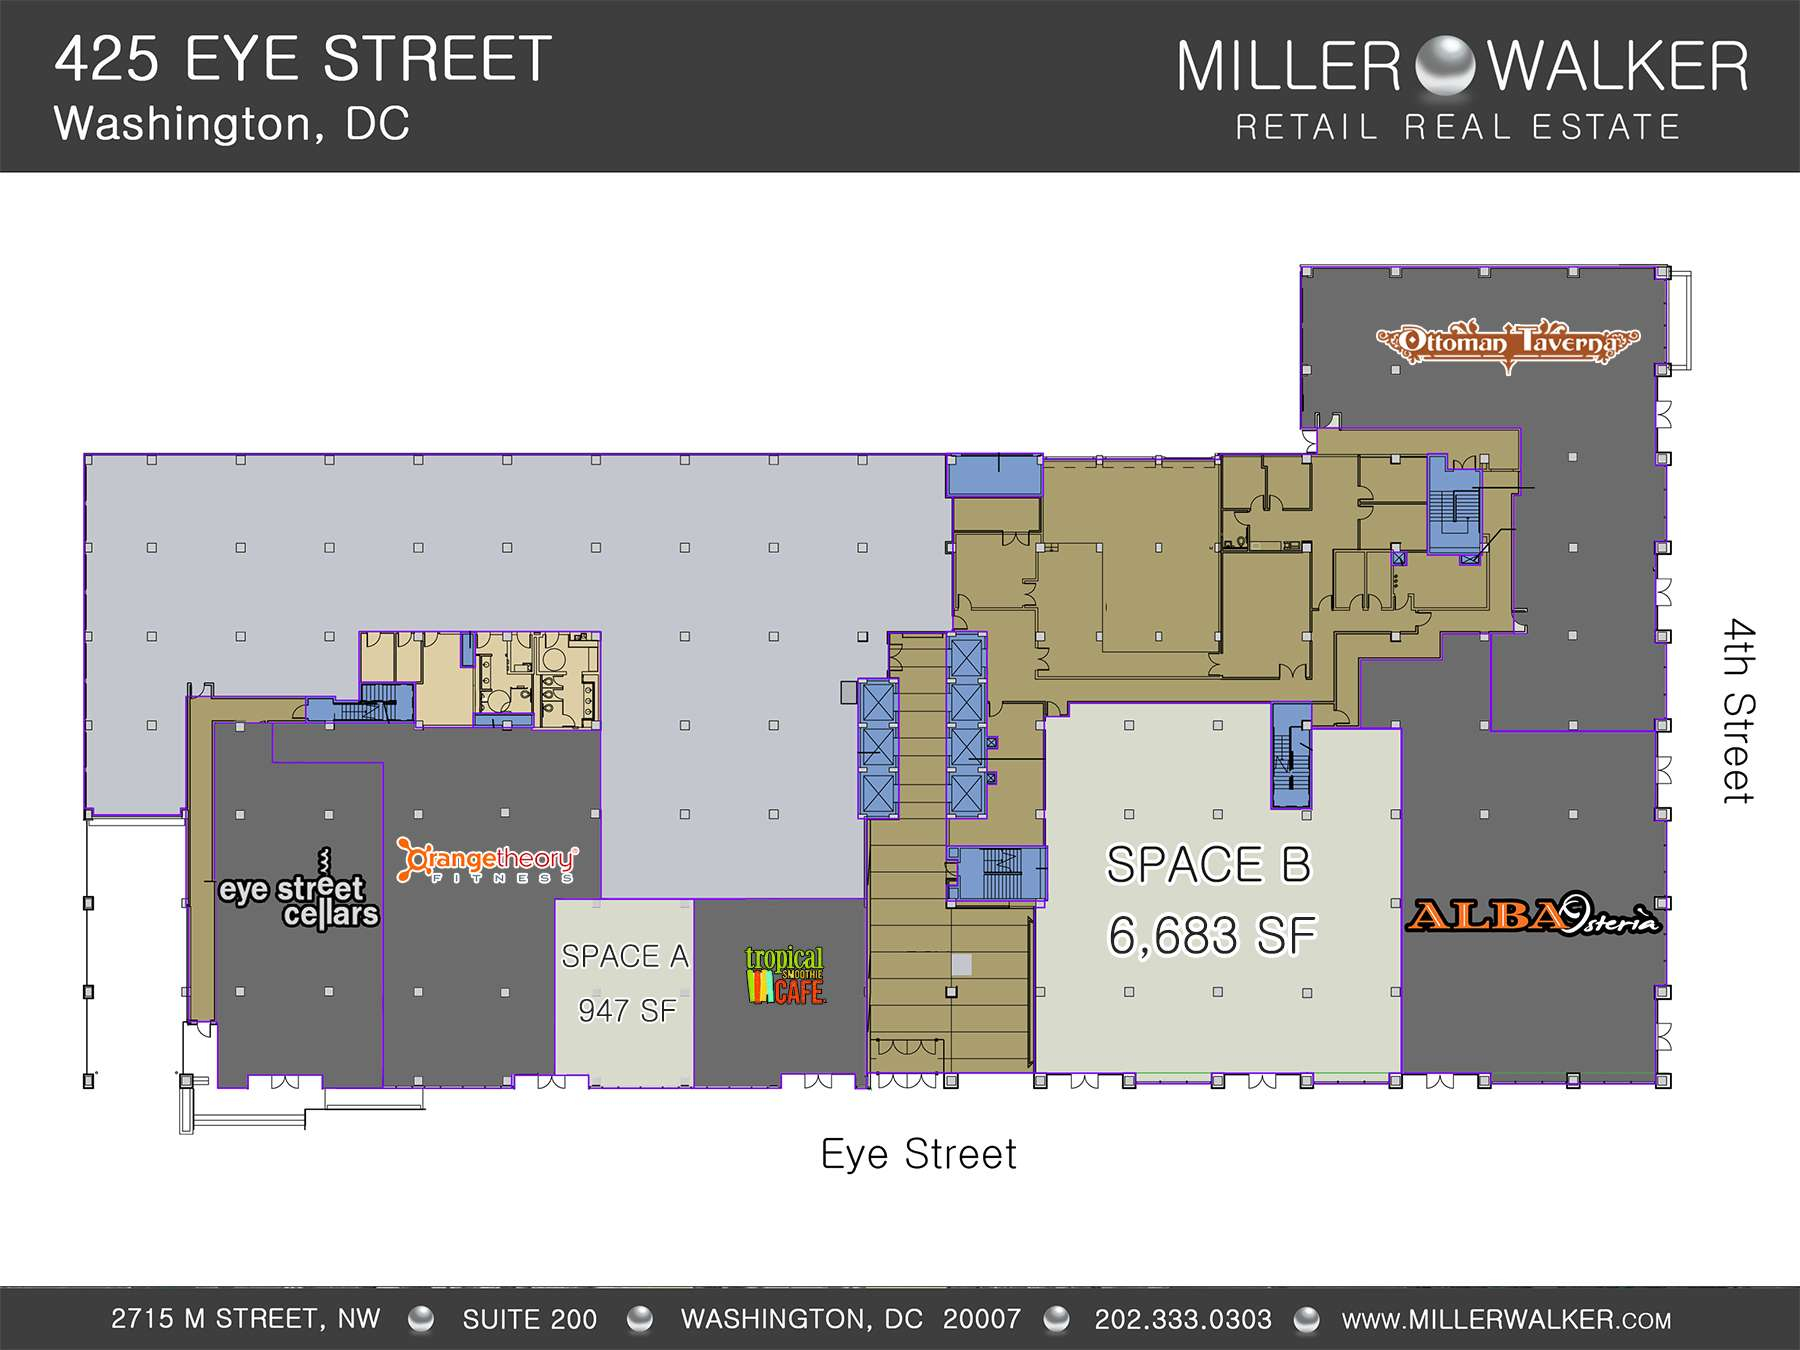 425-eye-street-plan-10-20-2016